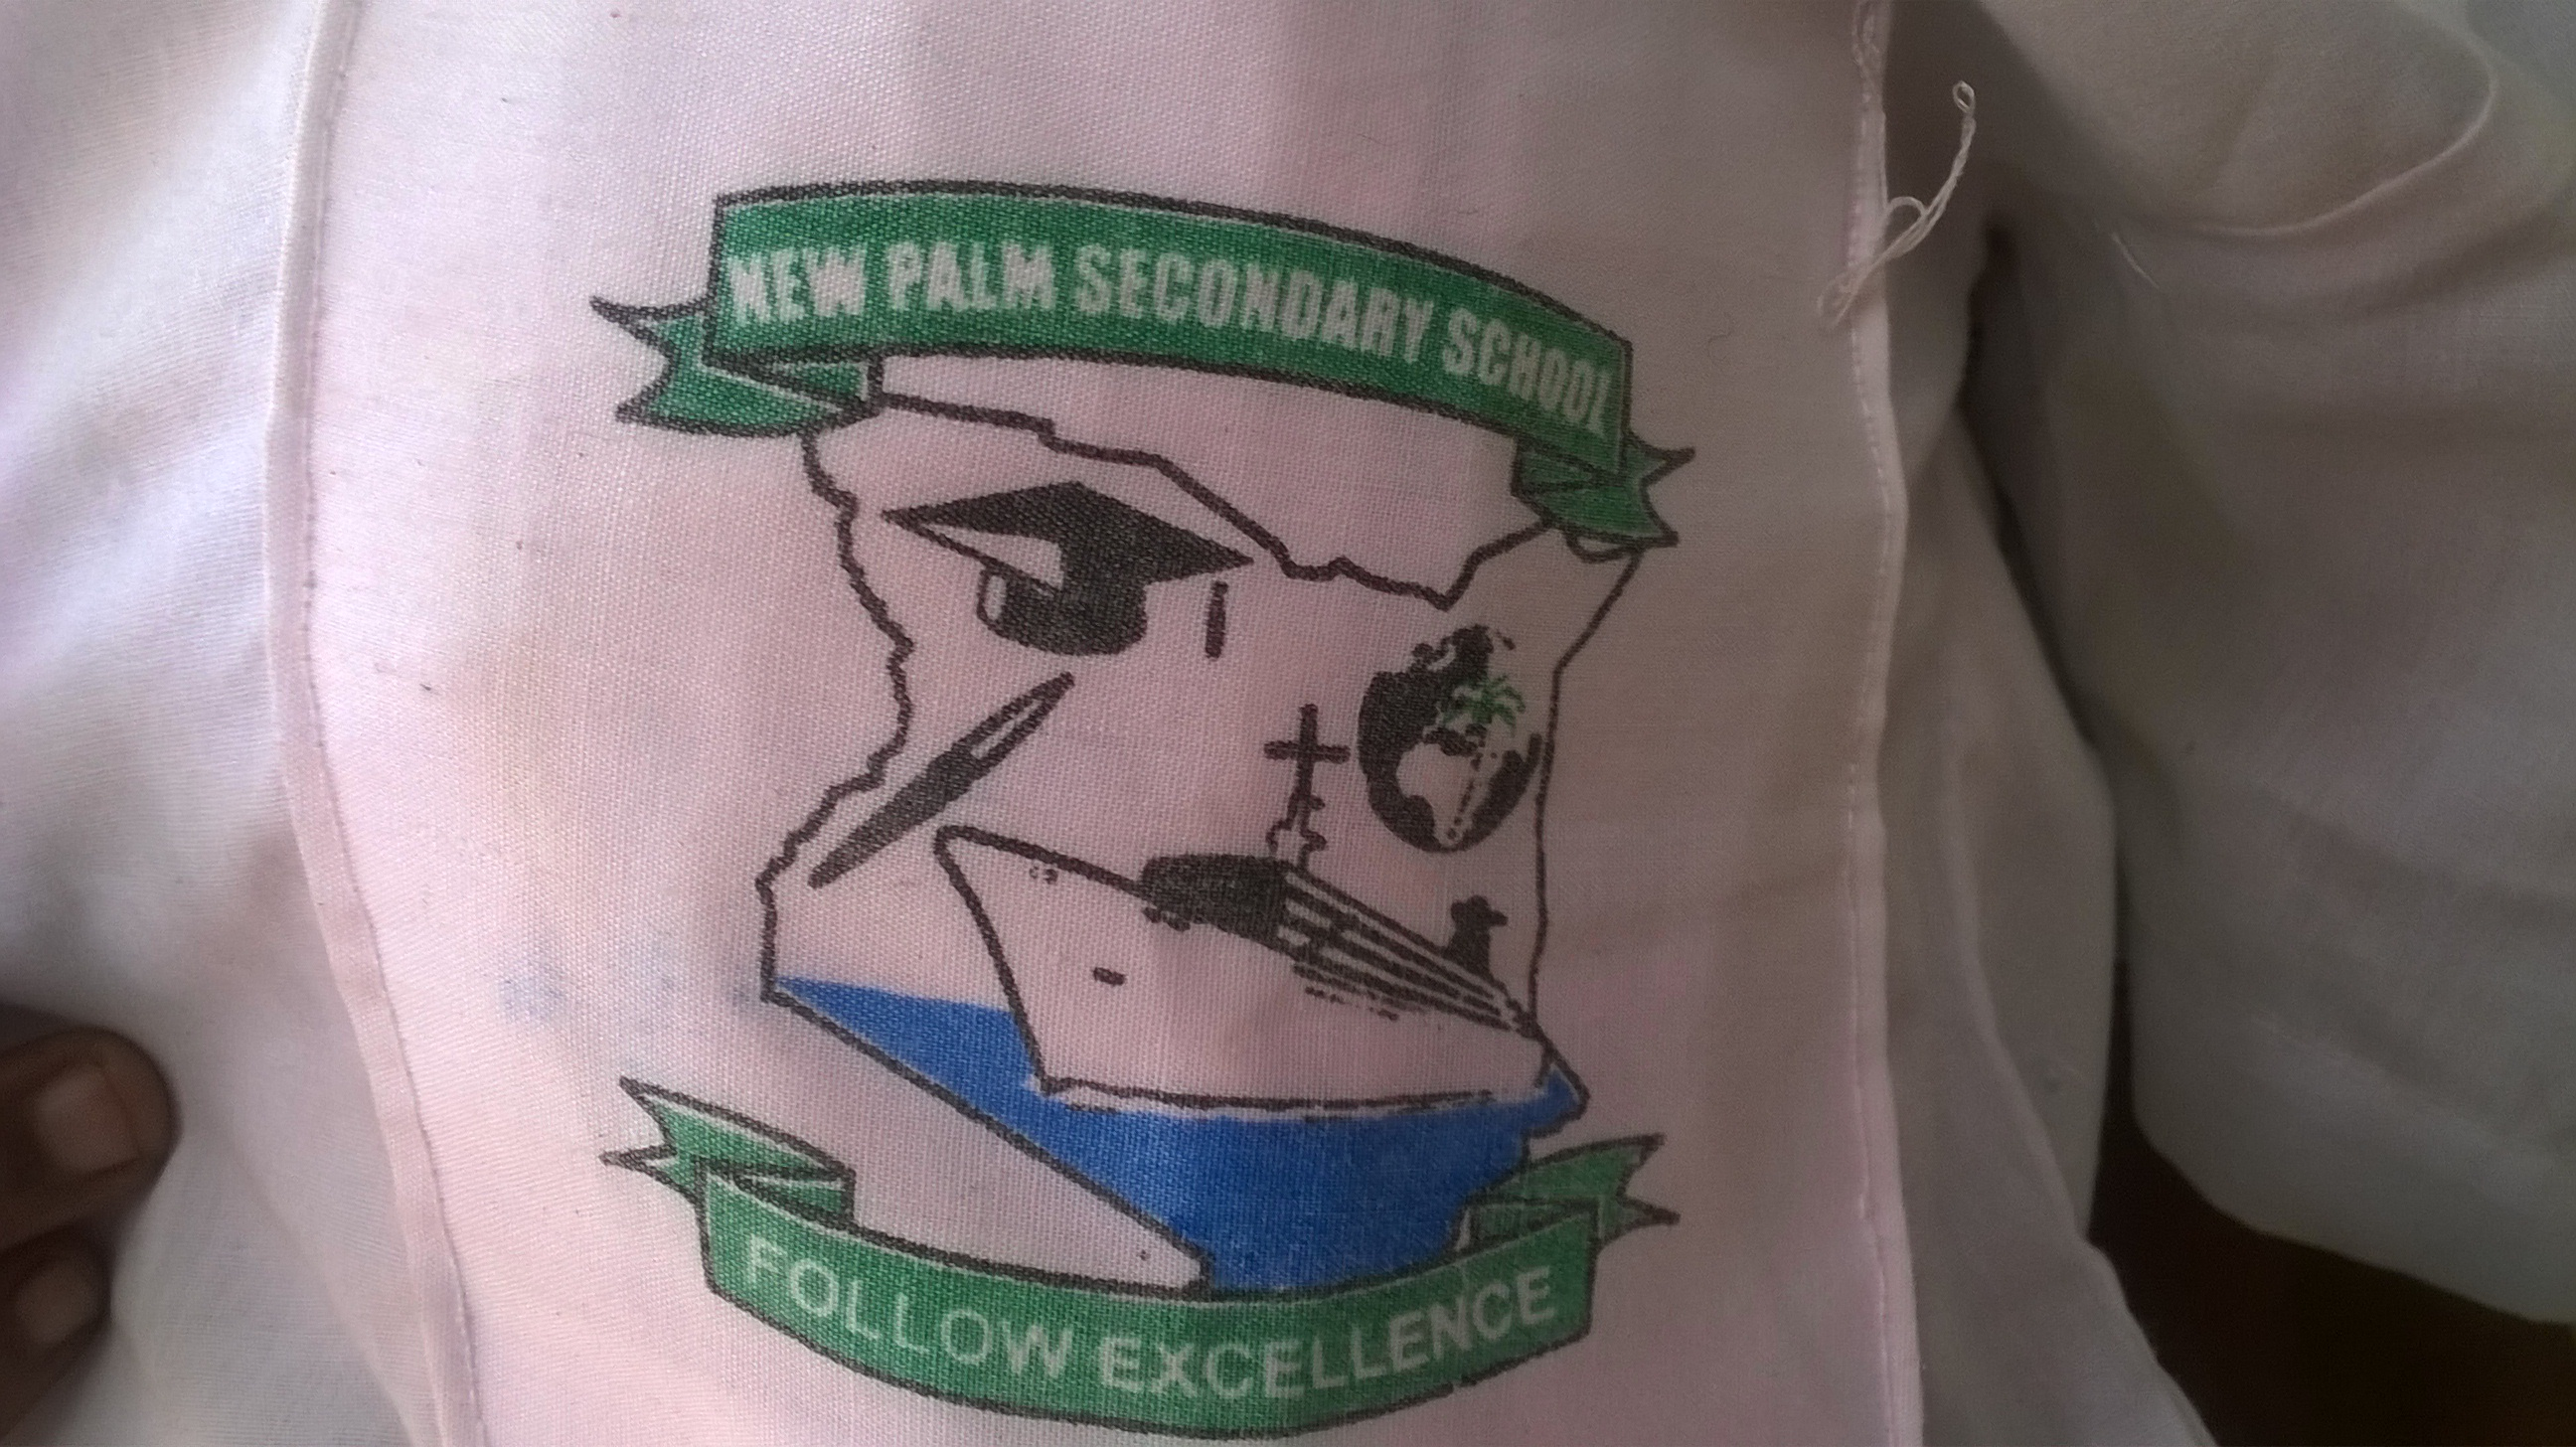 New Palms Secondary School